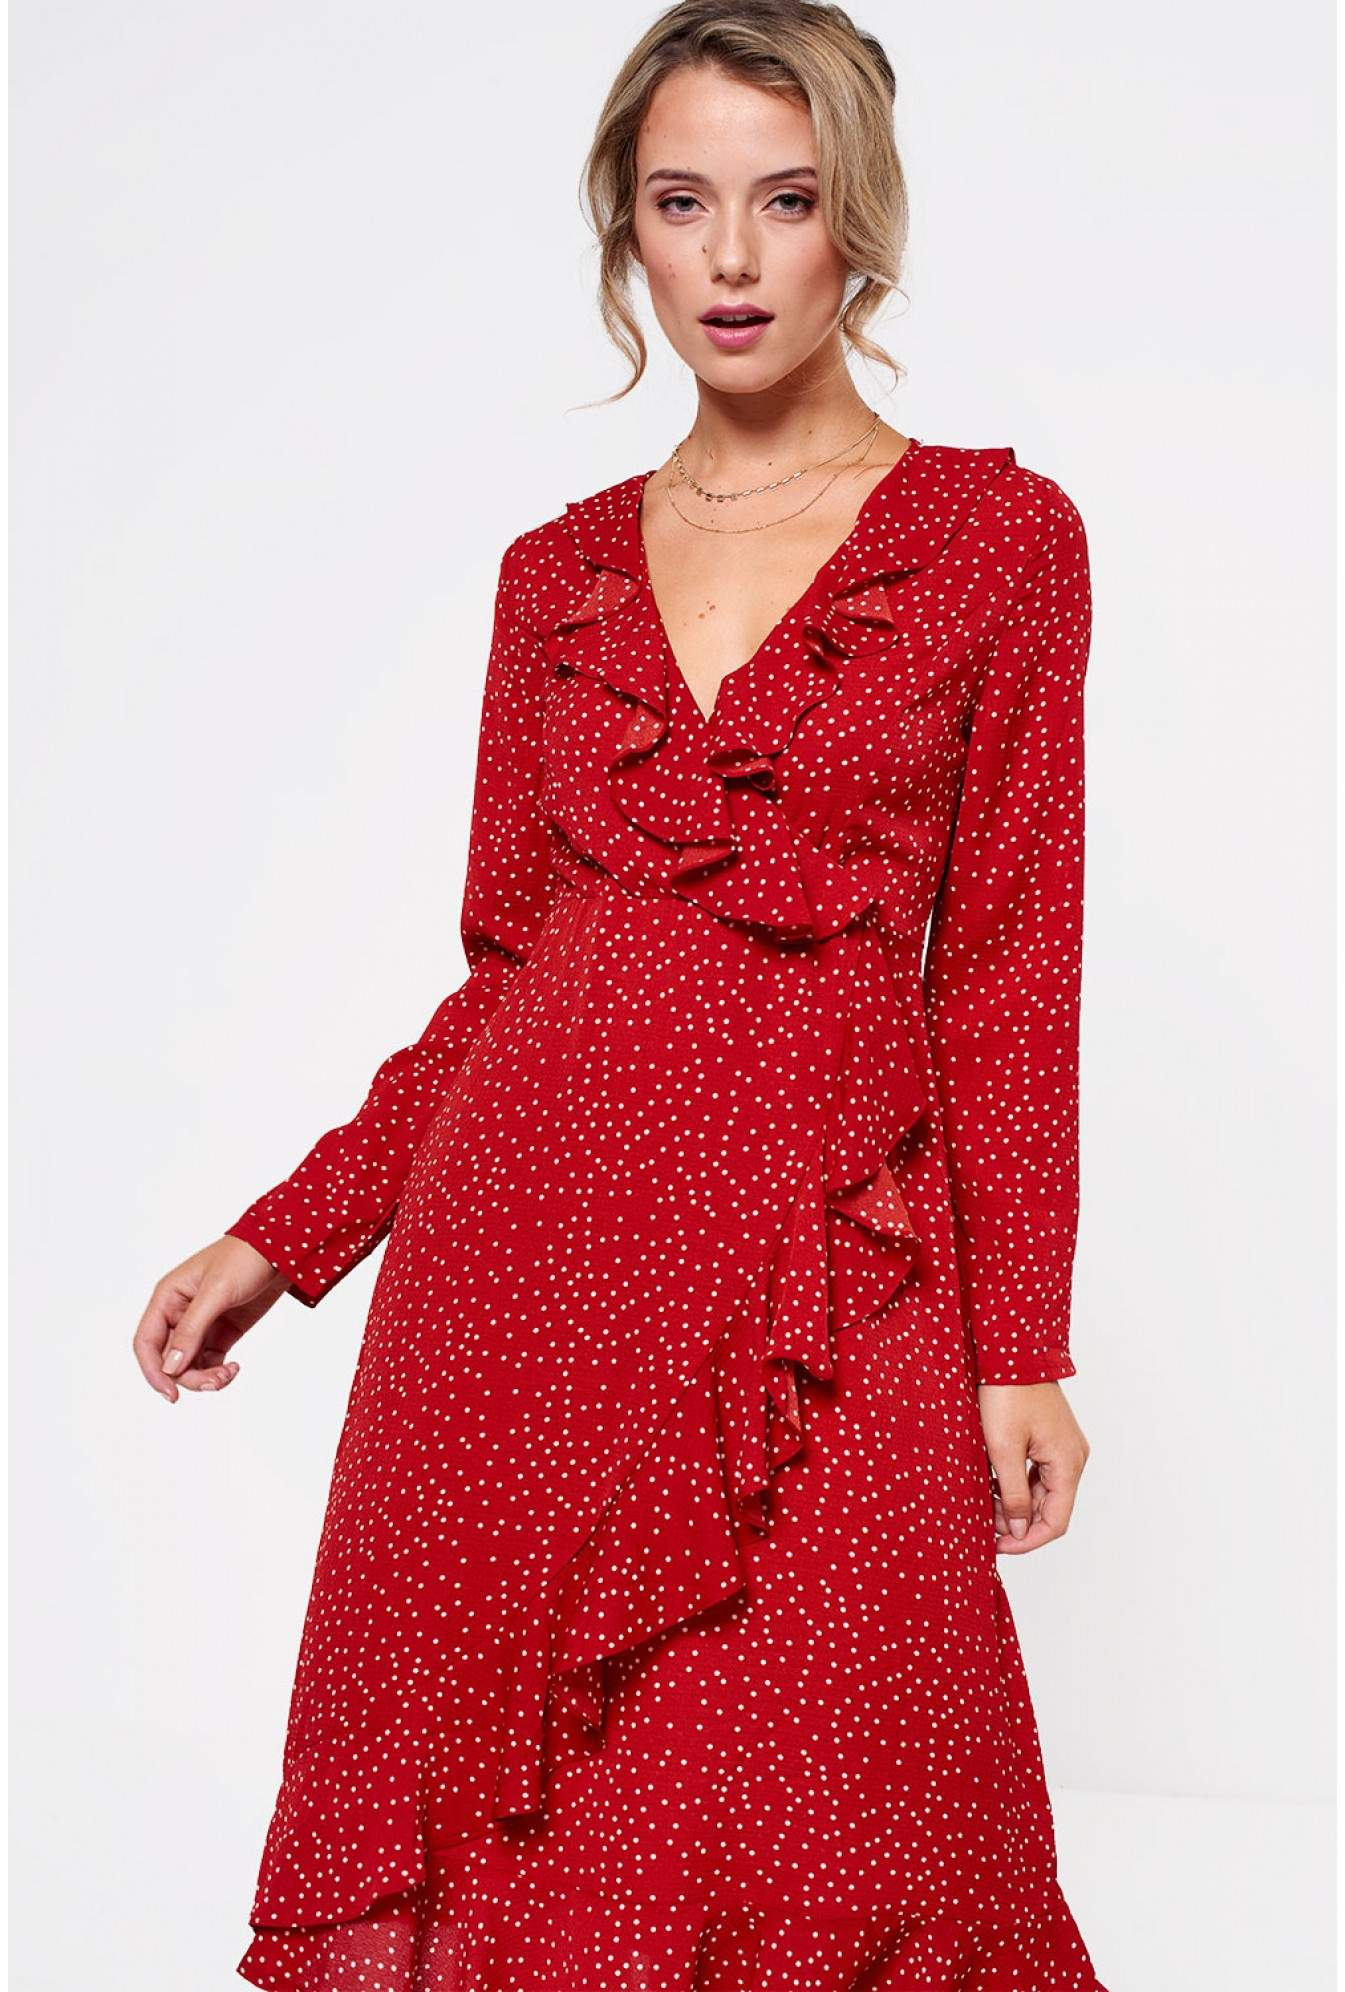 680560e746 More Views. Kara Frill Midi Dress in Red Polka Dot